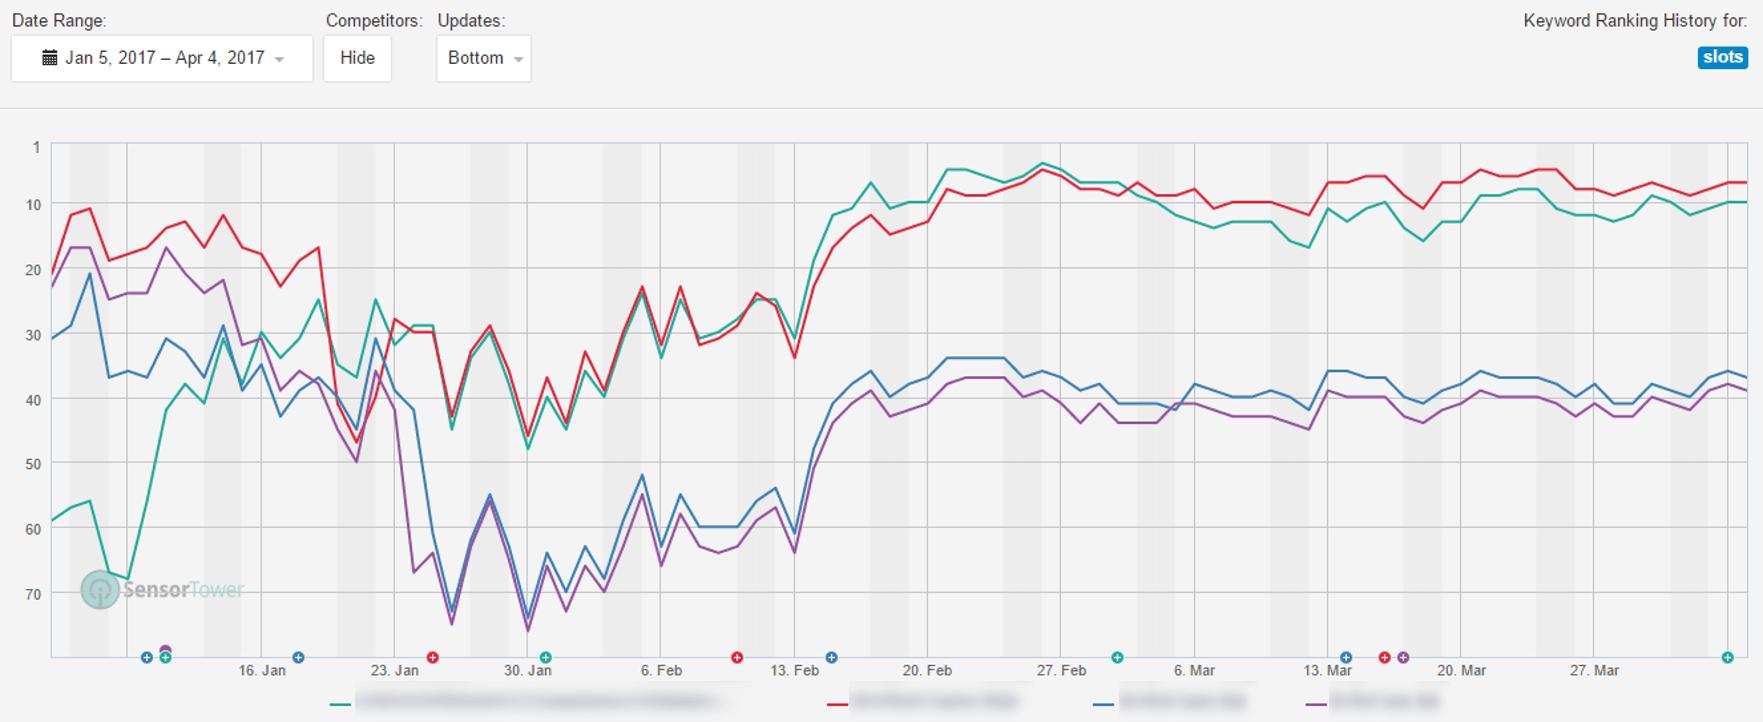 slots publisher keyword ranking 1